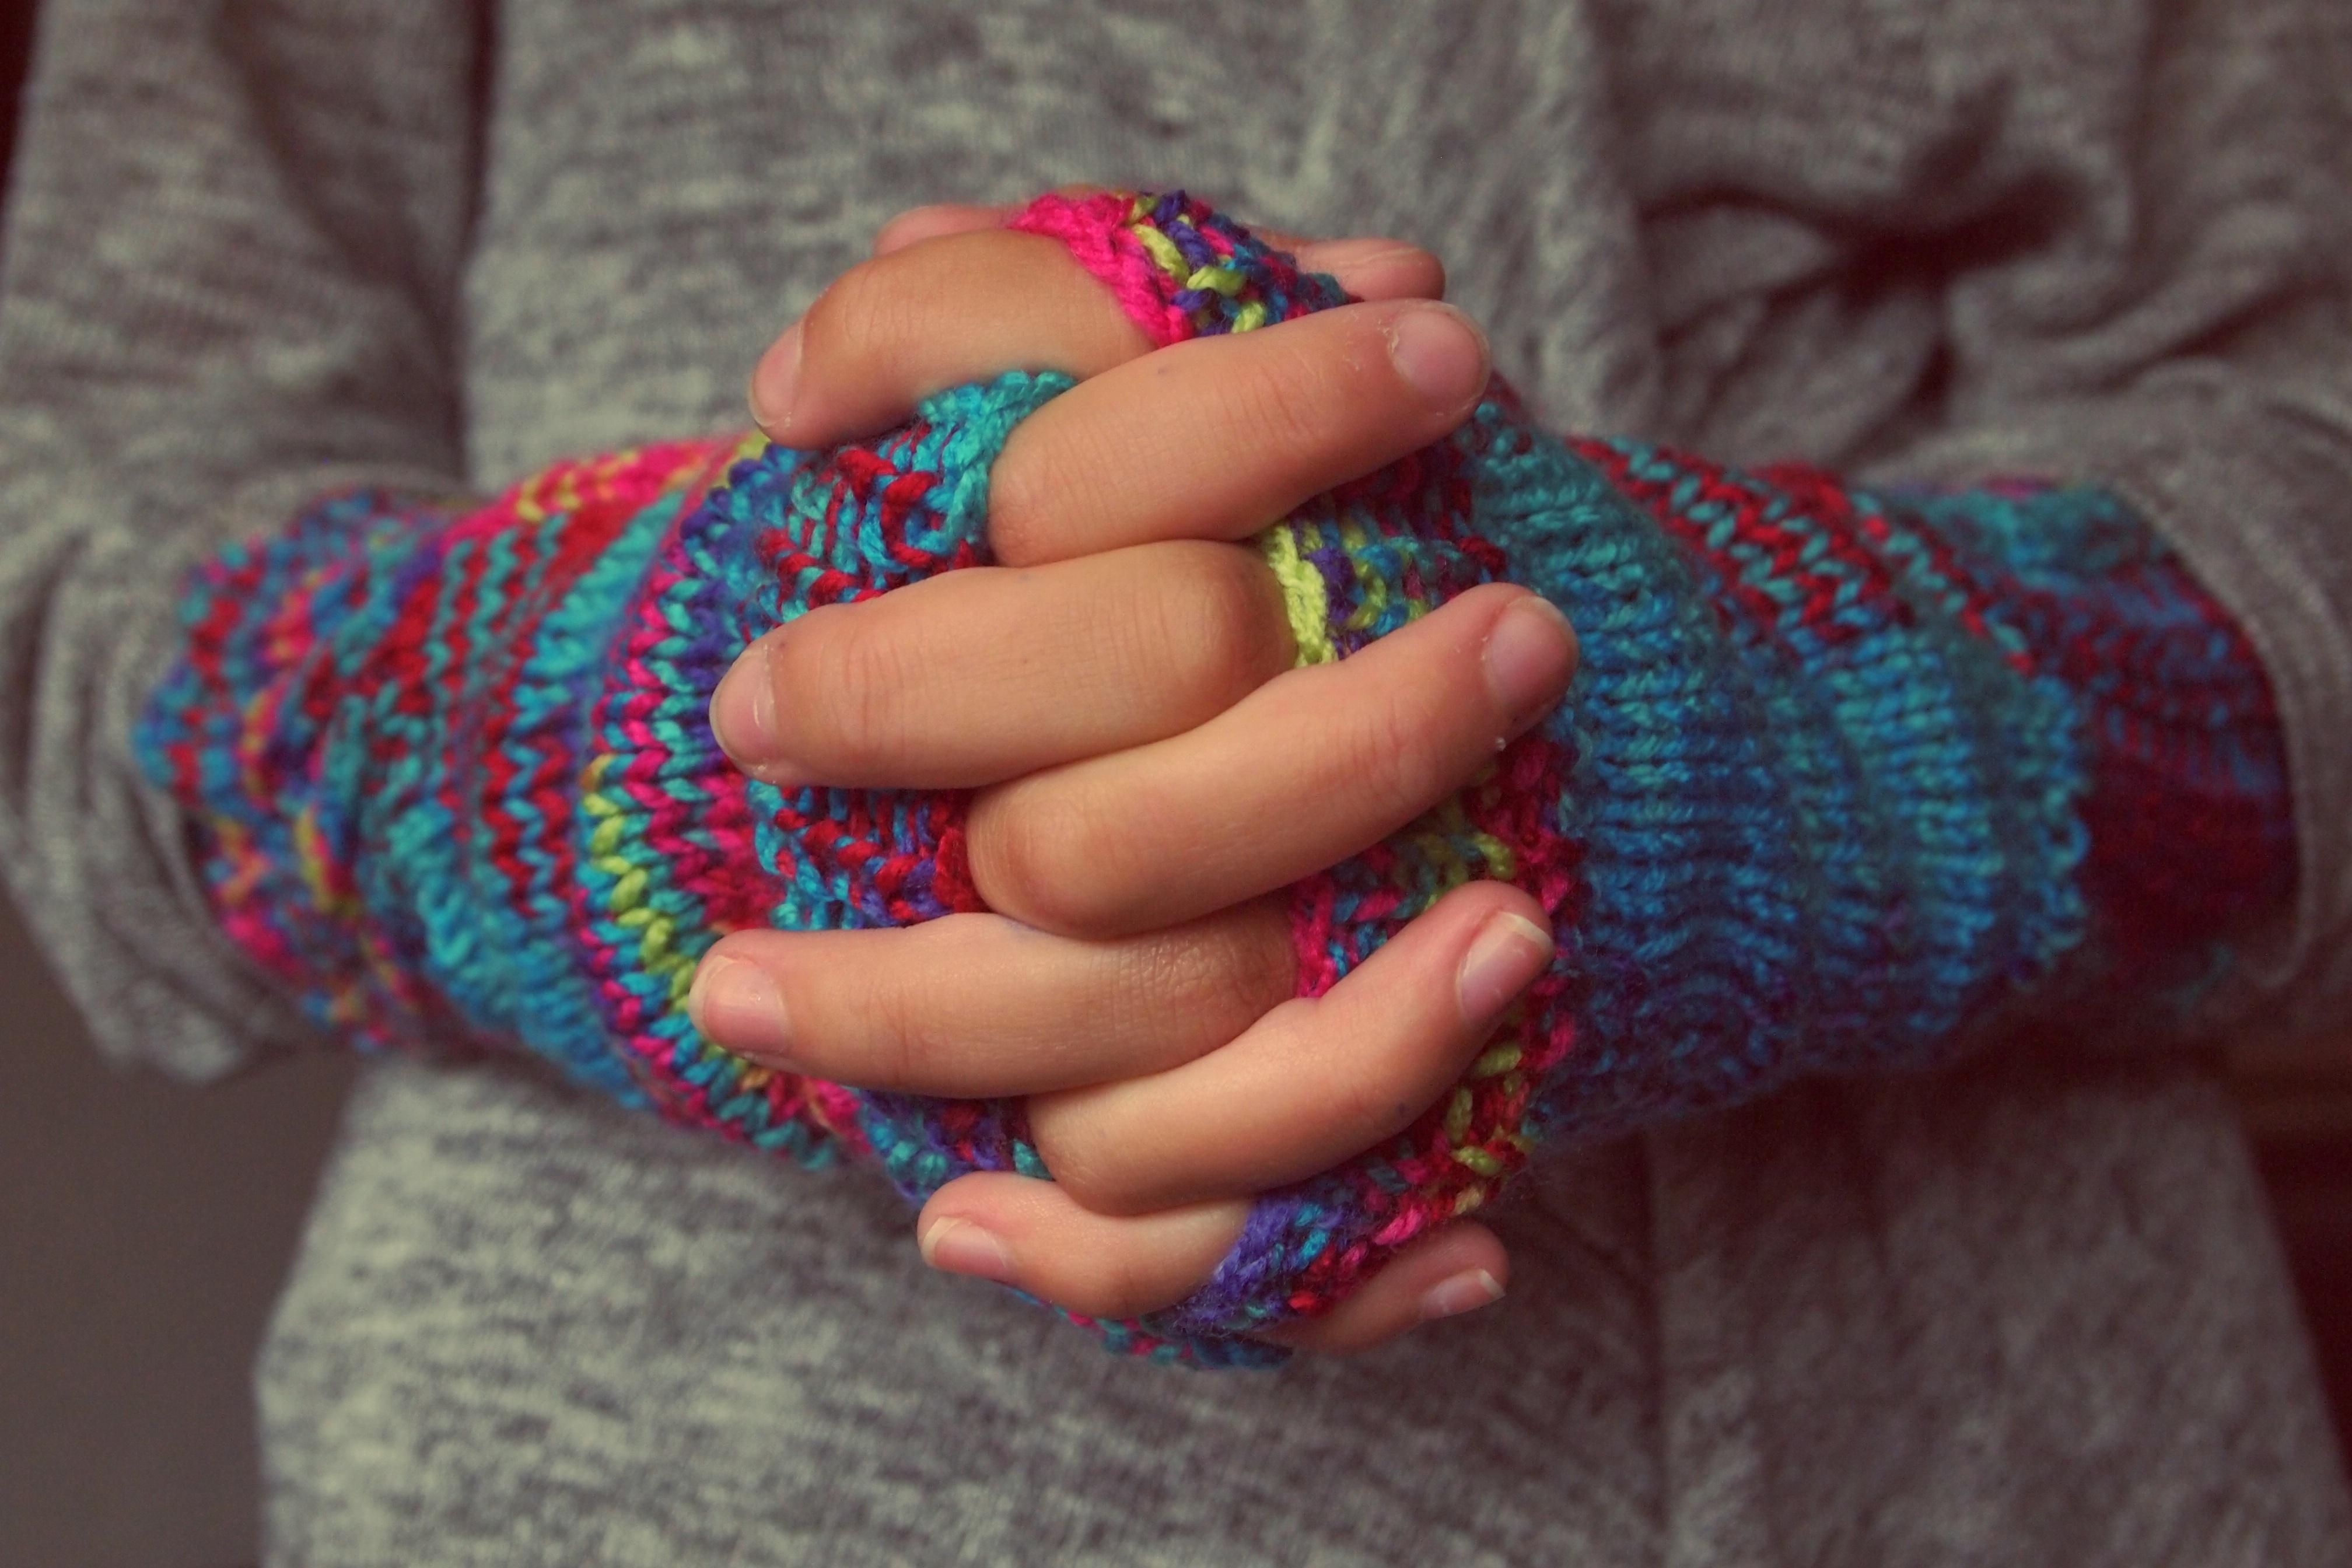 Kostenlose foto : Hand, kalt, Winter, Muster, Finger, Farbe, blau ...